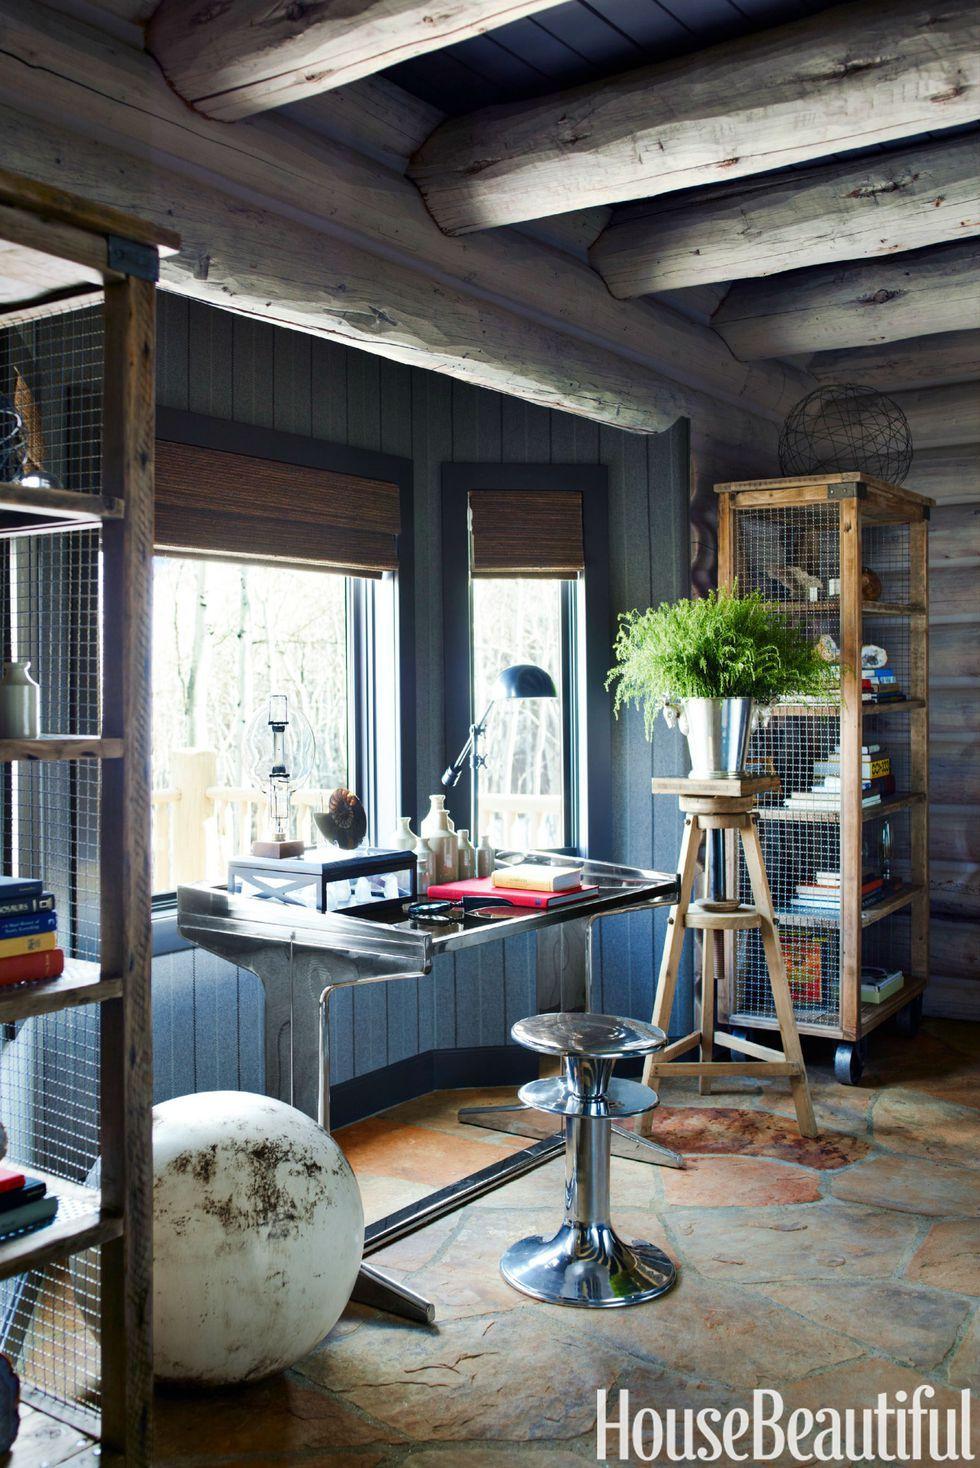 loft wohnung buhne gestalterische kreativitat, 50 inspirational quotes to help you build a home office #homeoffice, Design ideen